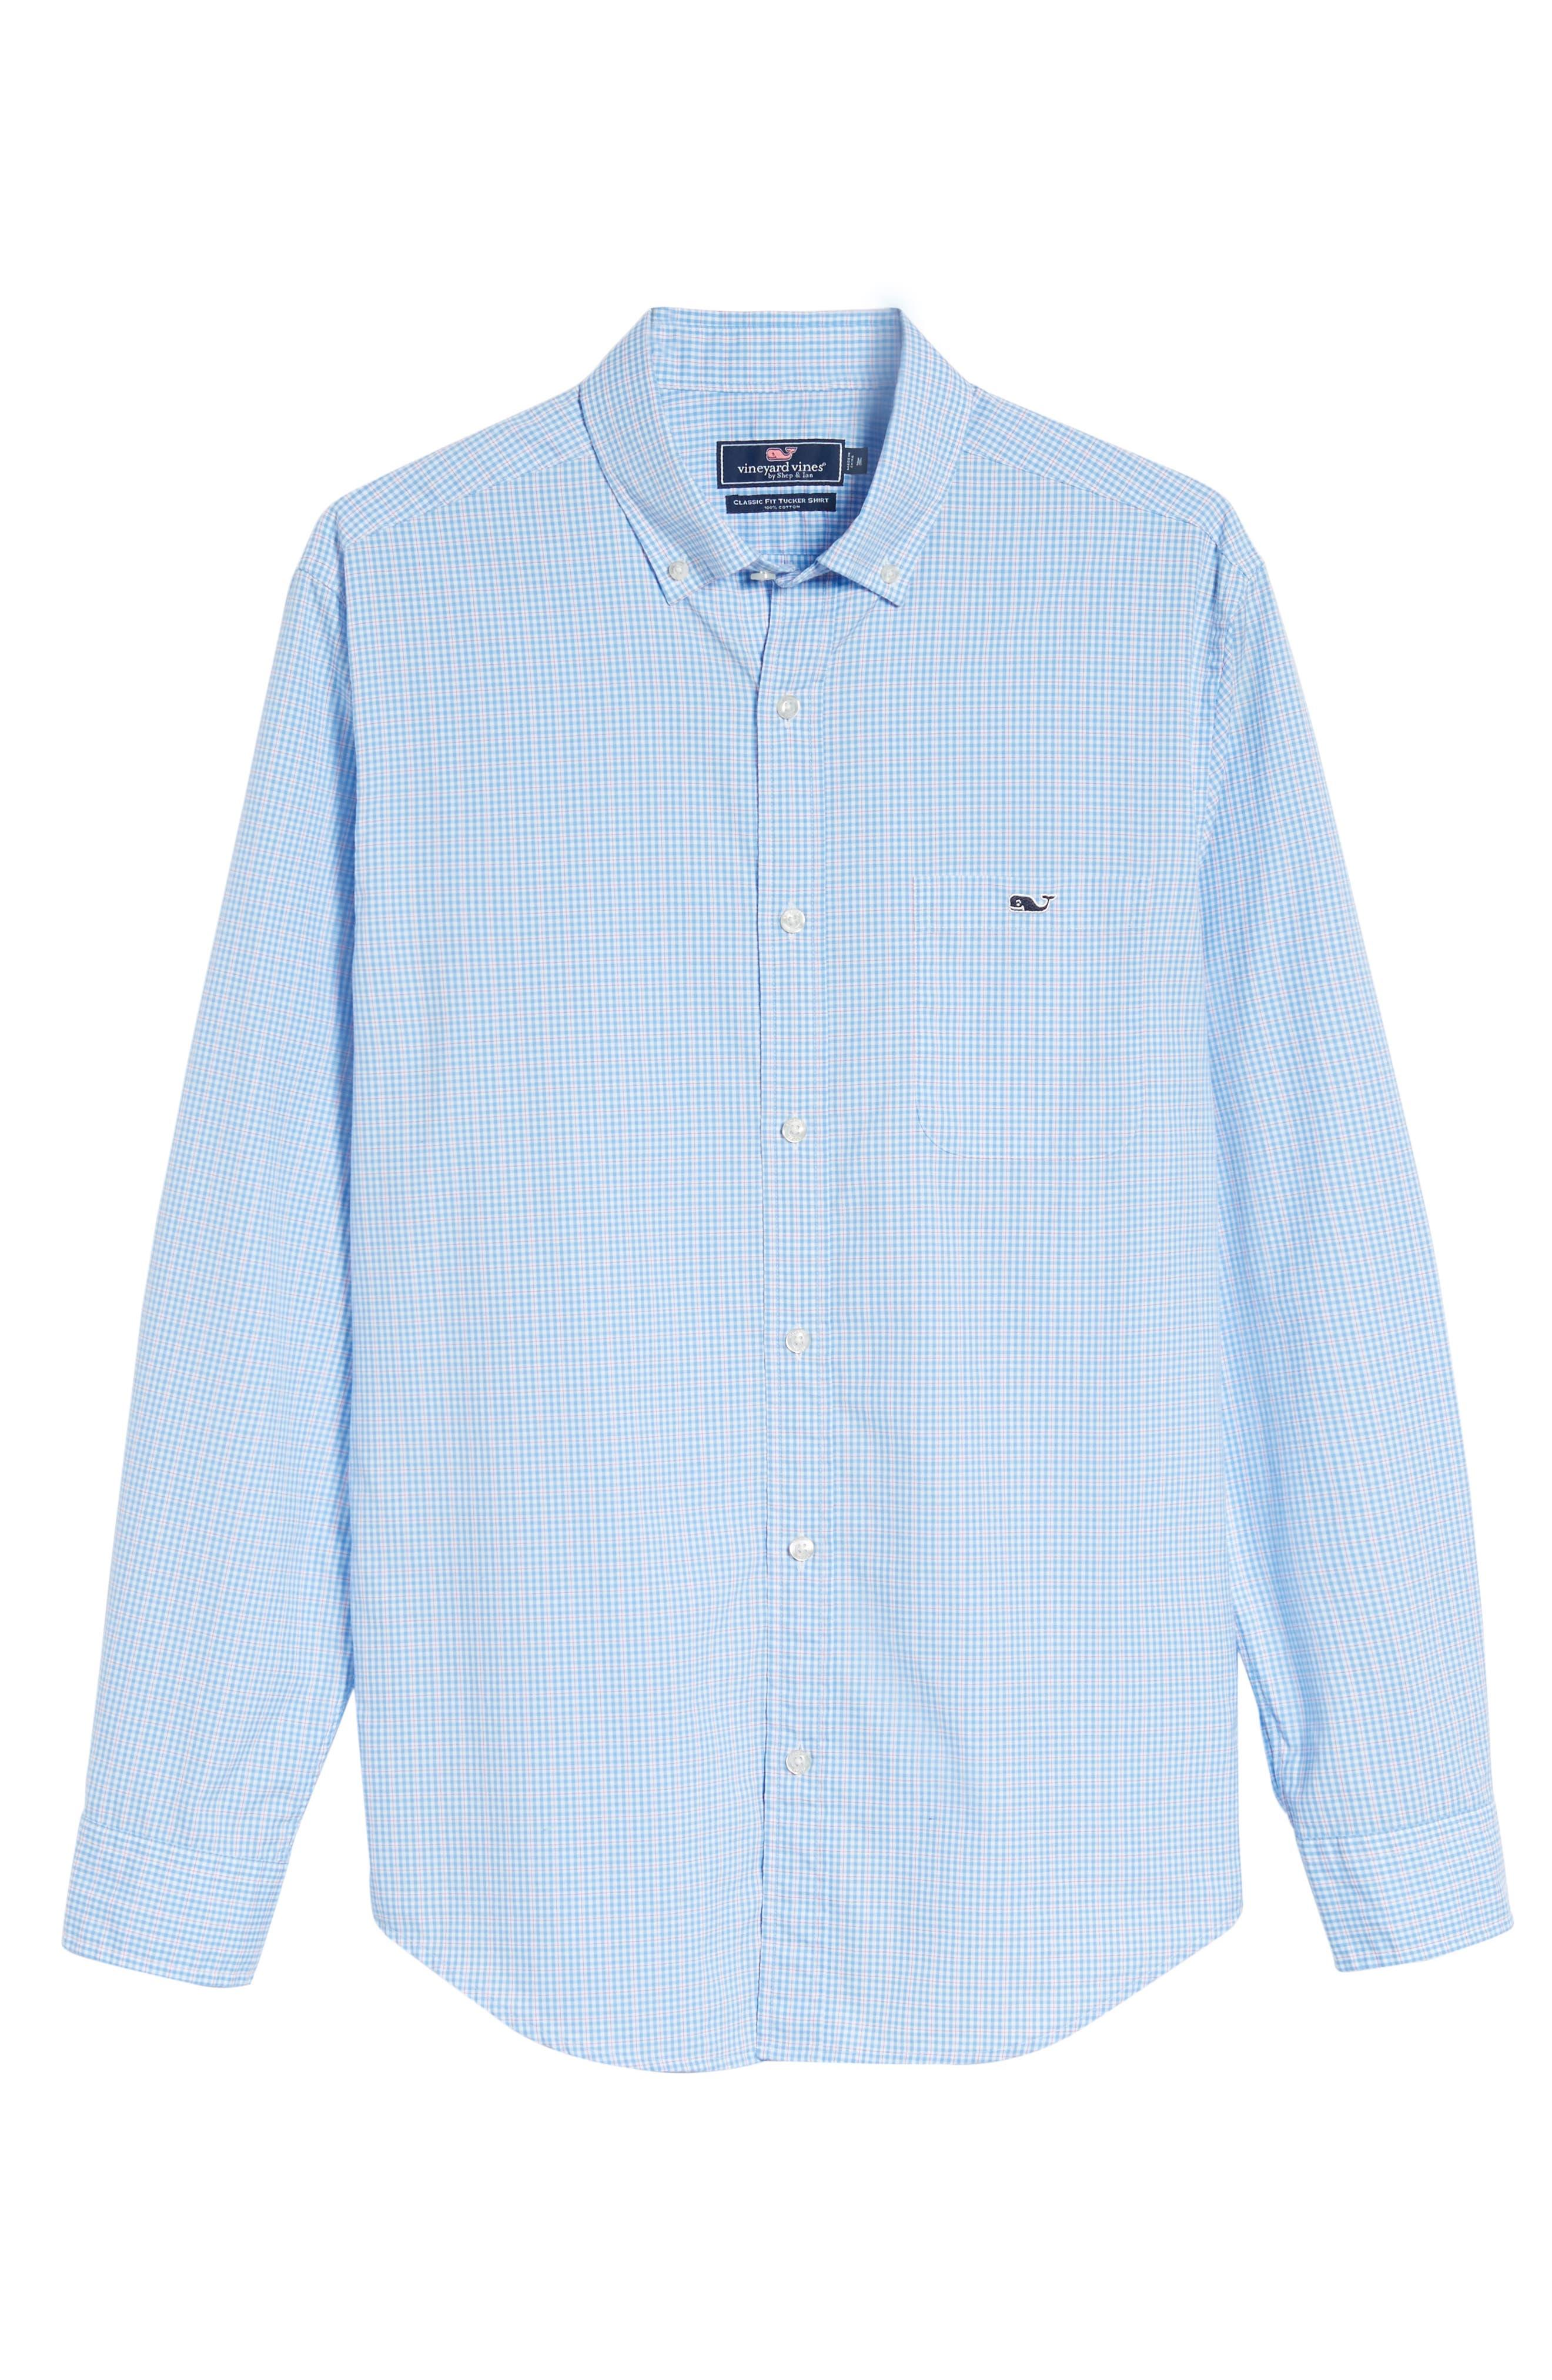 Stowaway Plaid Tucker Classic Fit Sport Shirt,                             Alternate thumbnail 6, color,                             484